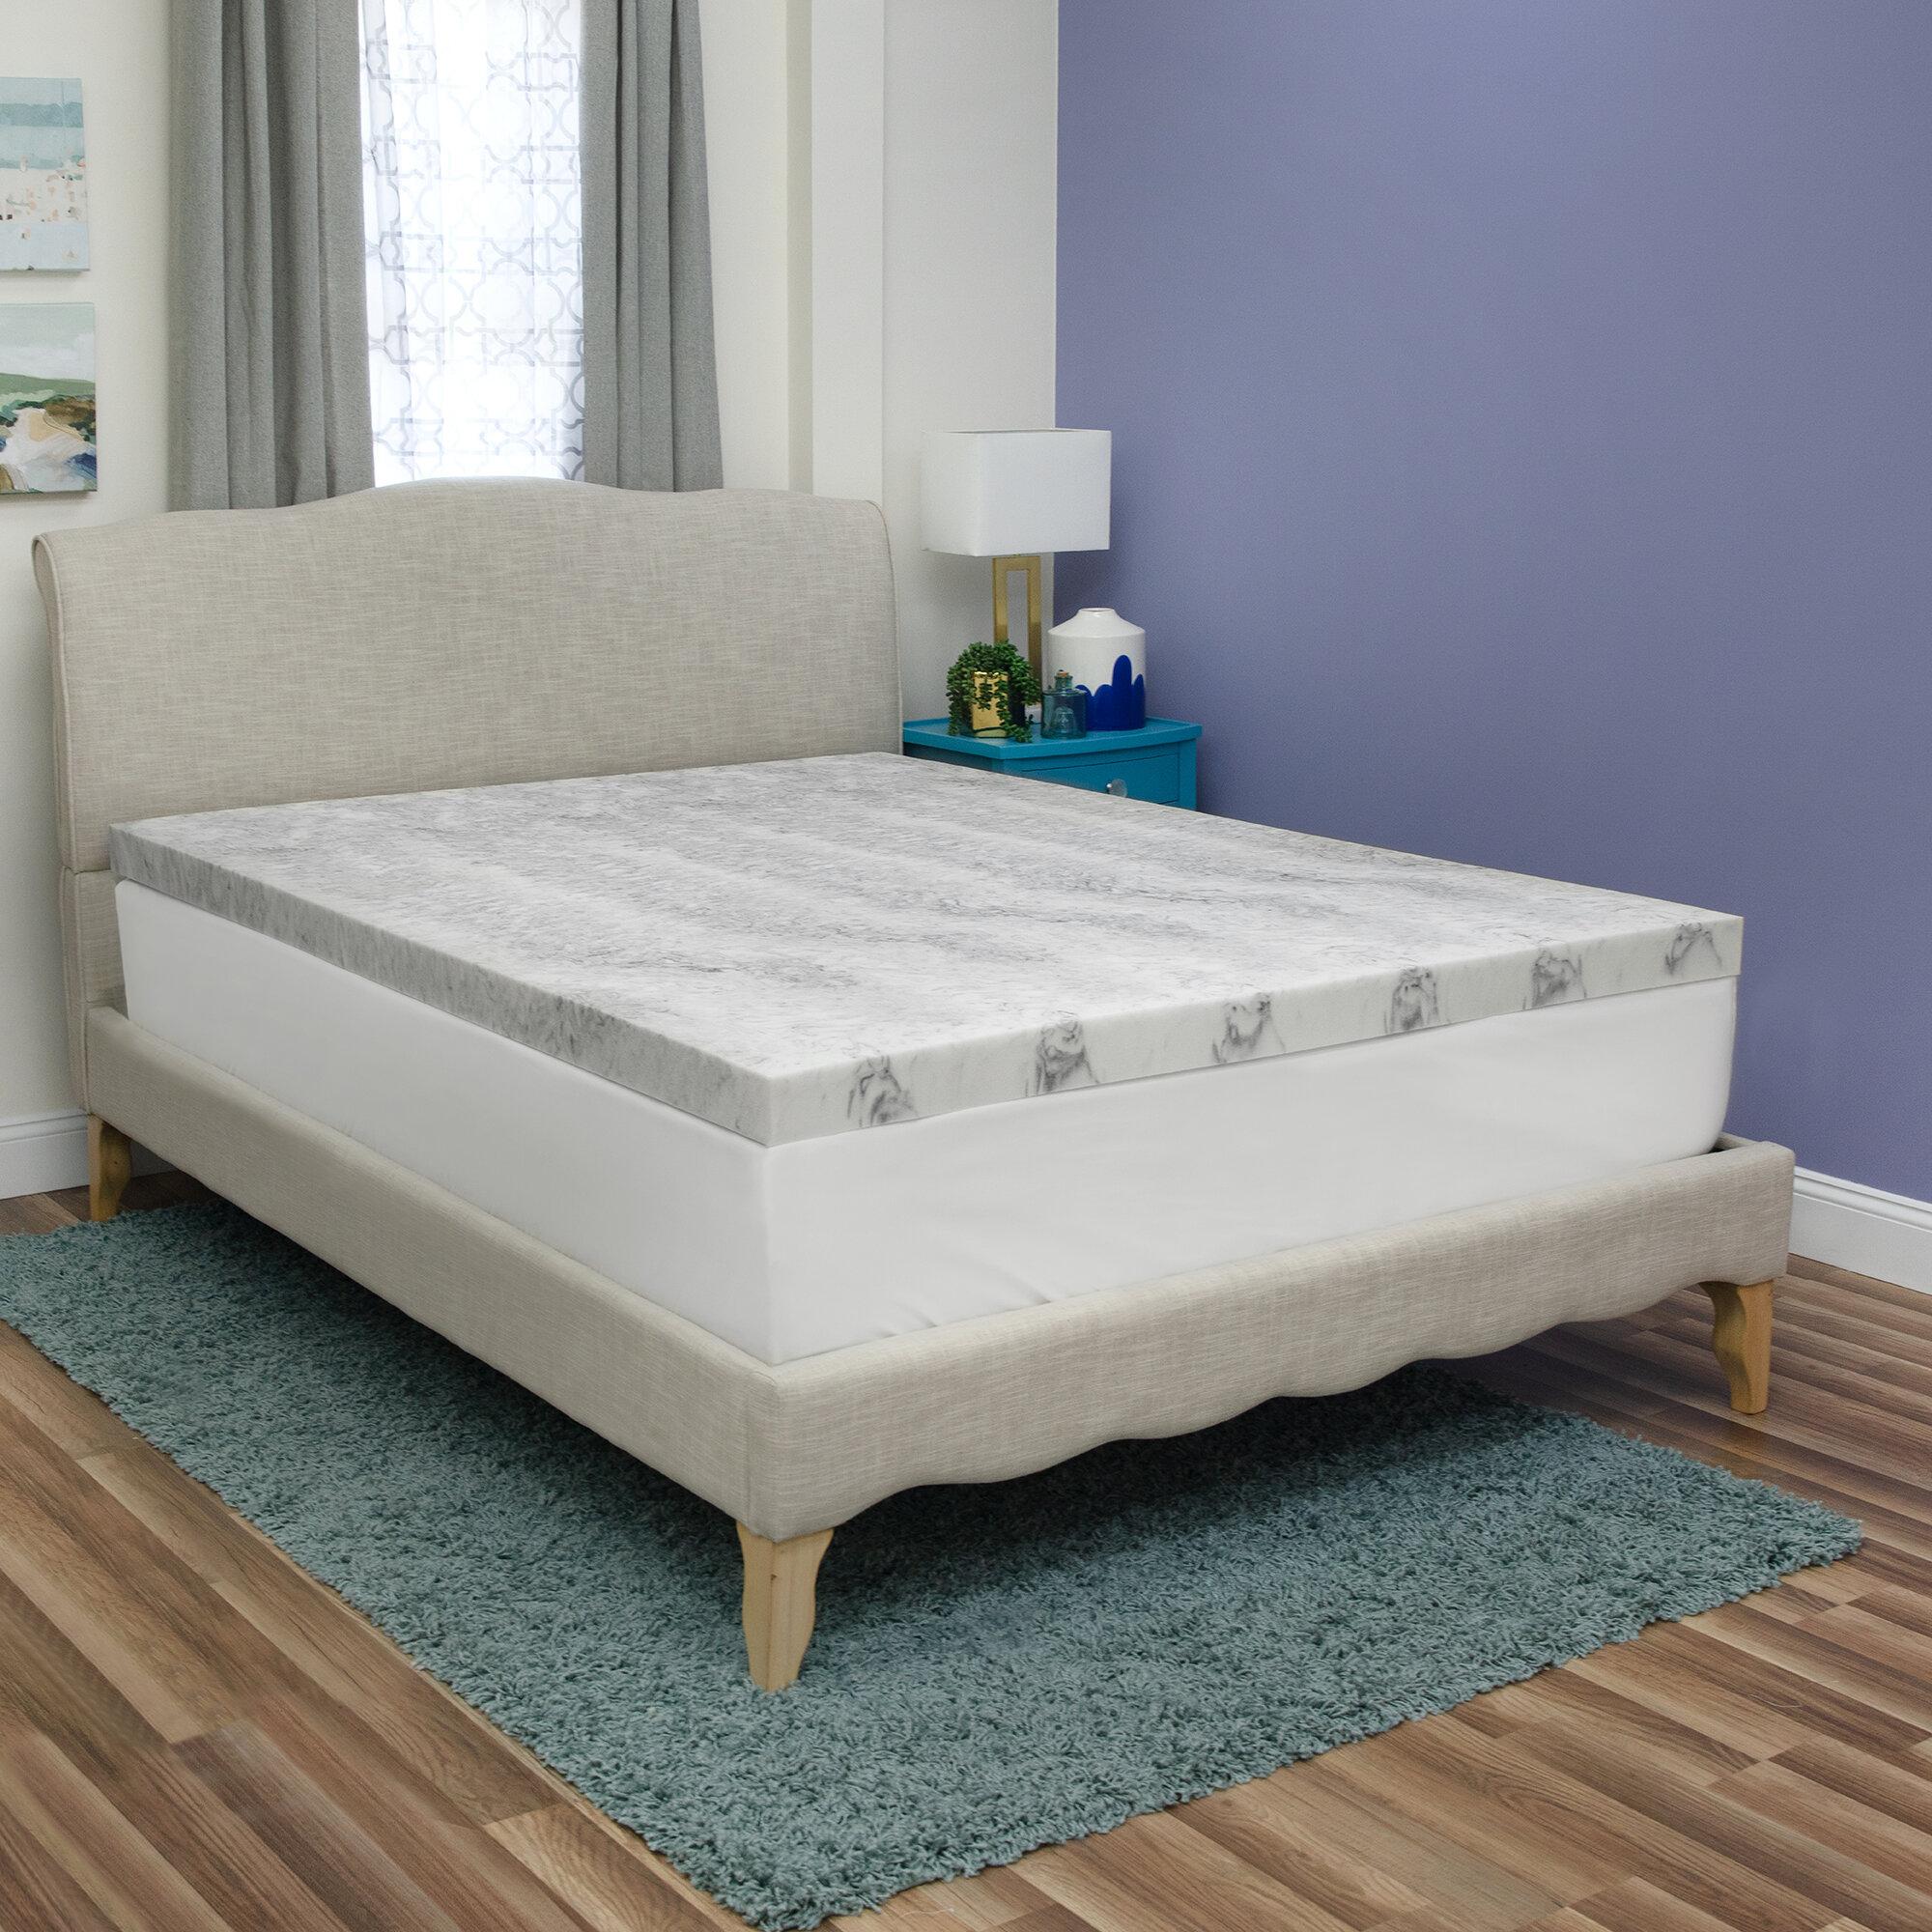 Sensorpedic Bamboo 3 Memory Foam Mattress Topper Reviews Wayfair